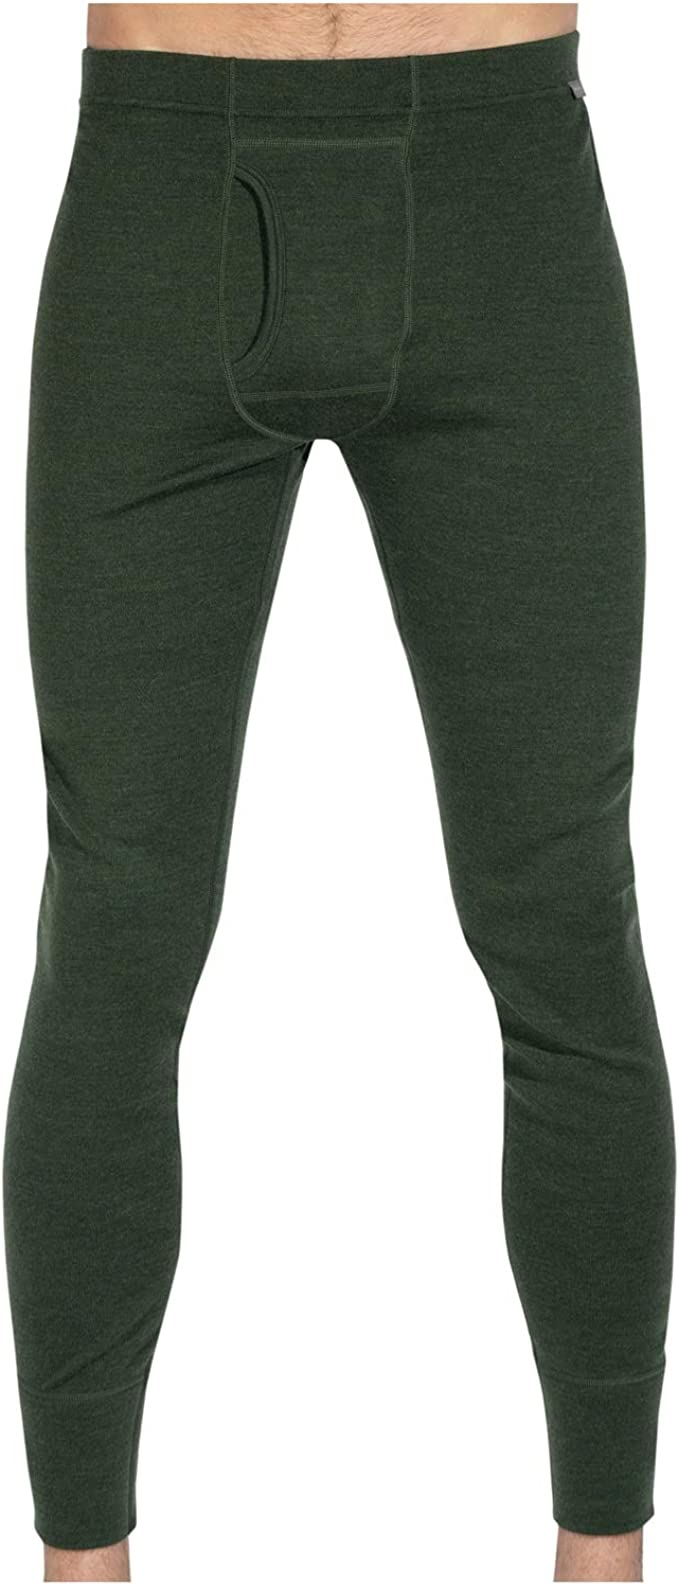 MERIWOOL Mens Base Layer 100/% Merino Wool Heavyweight 400g Thermal Pants